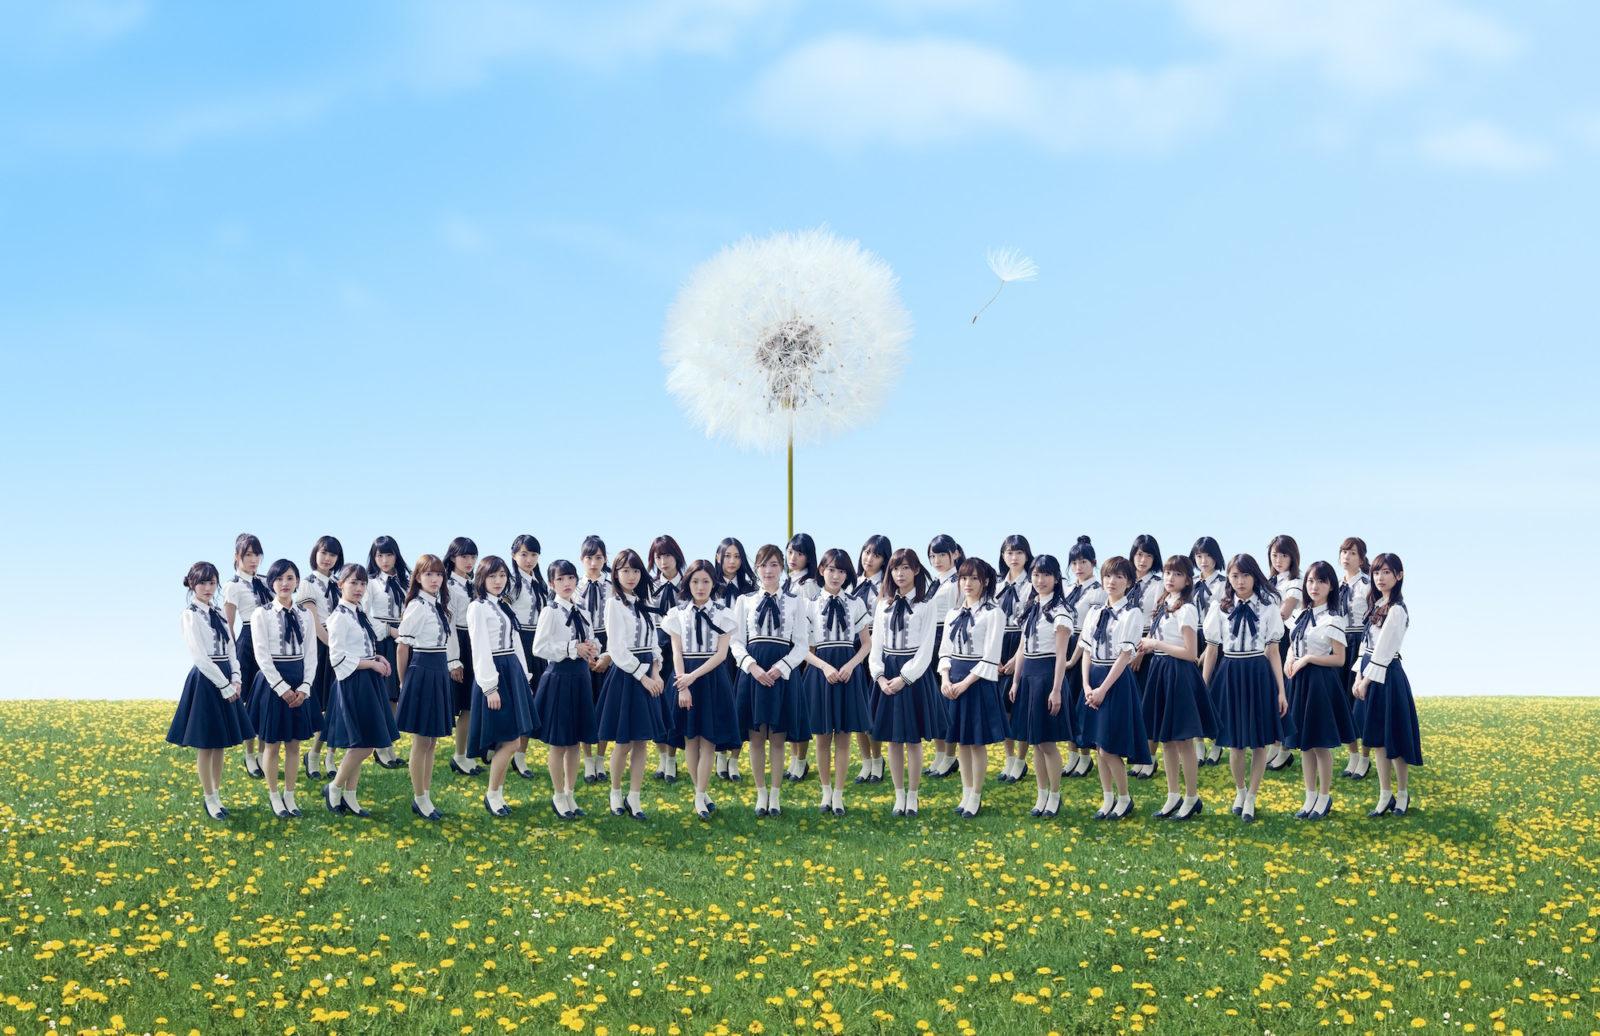 AKB48・峯岸みなみが後輩メンバーとの関係性について言及「張り詰めた空気とか…」サムネイル画像